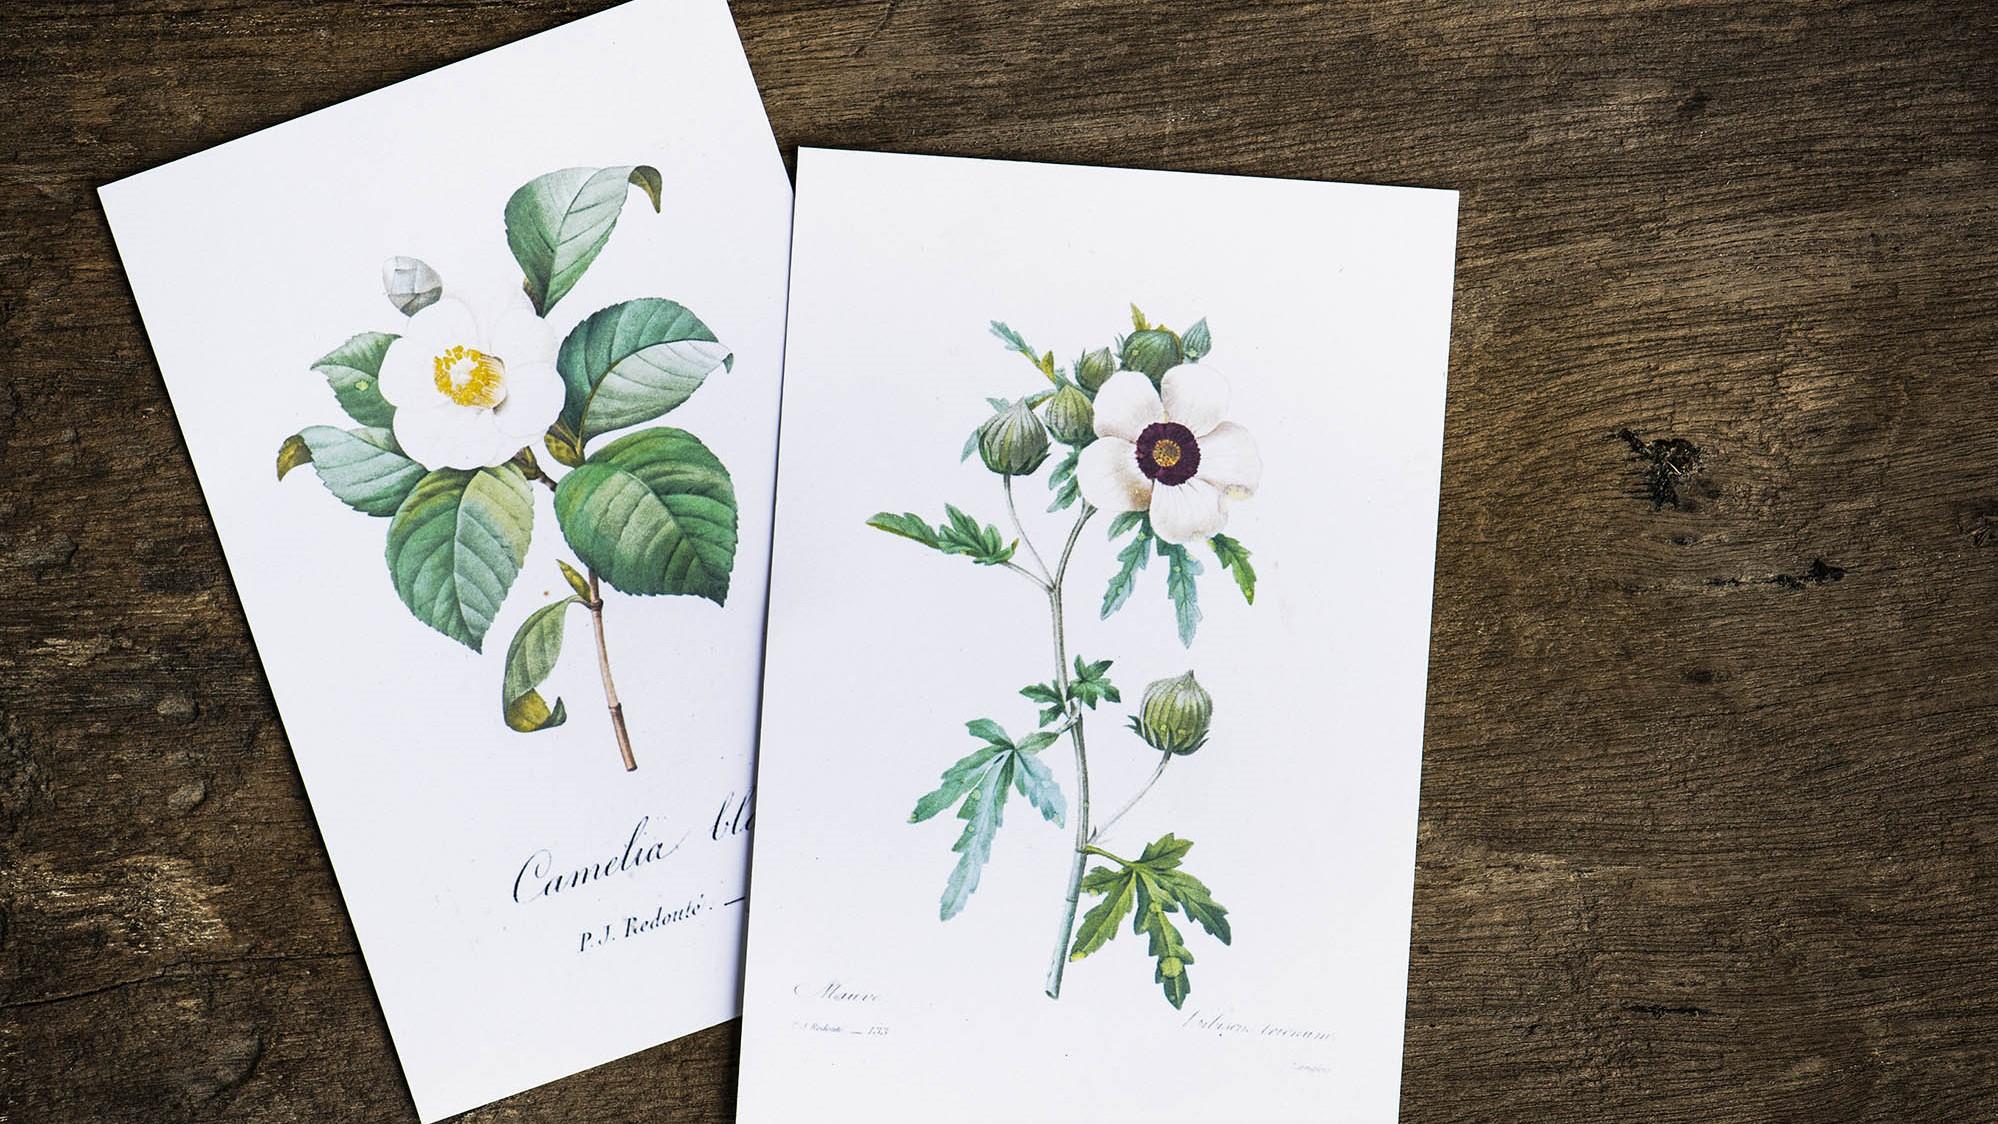 Floral designed greeting cards